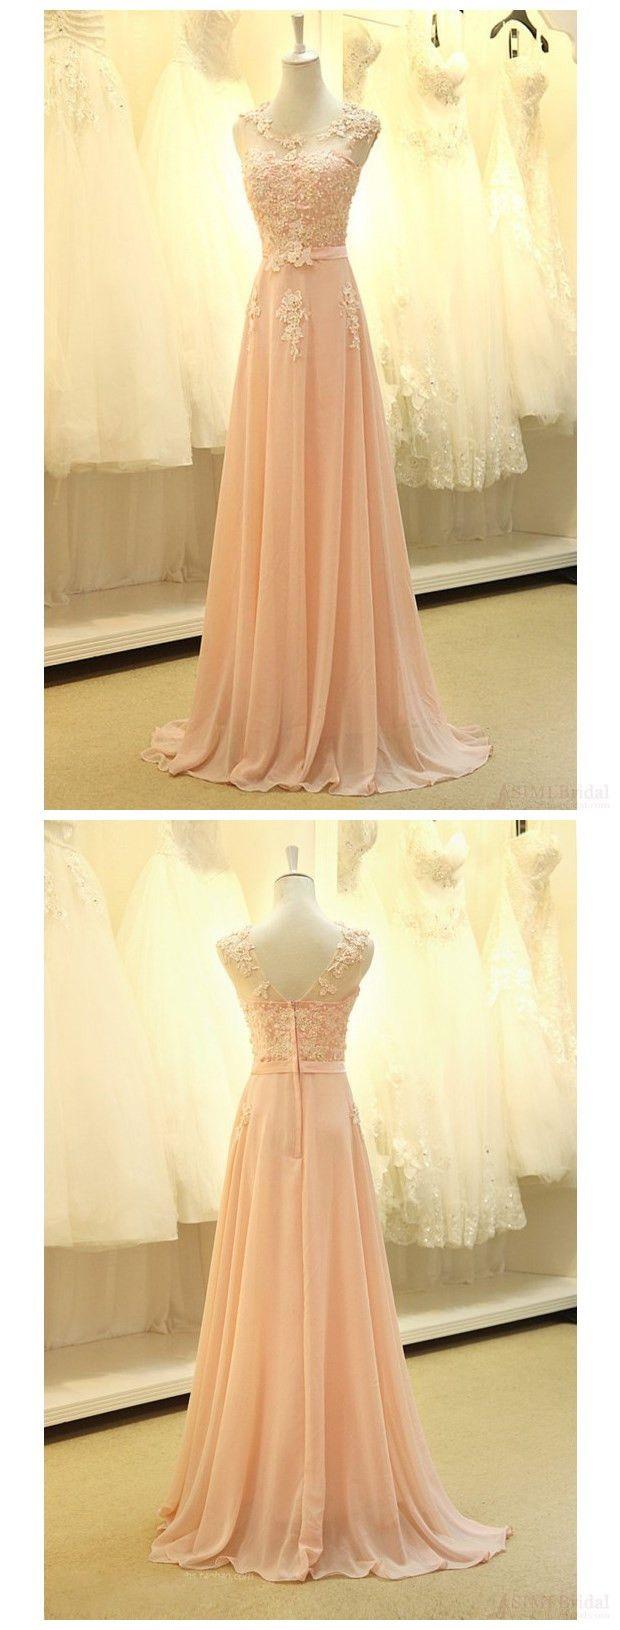 Applique prom dress,prom dresses 2016,#promdresses #simibridal